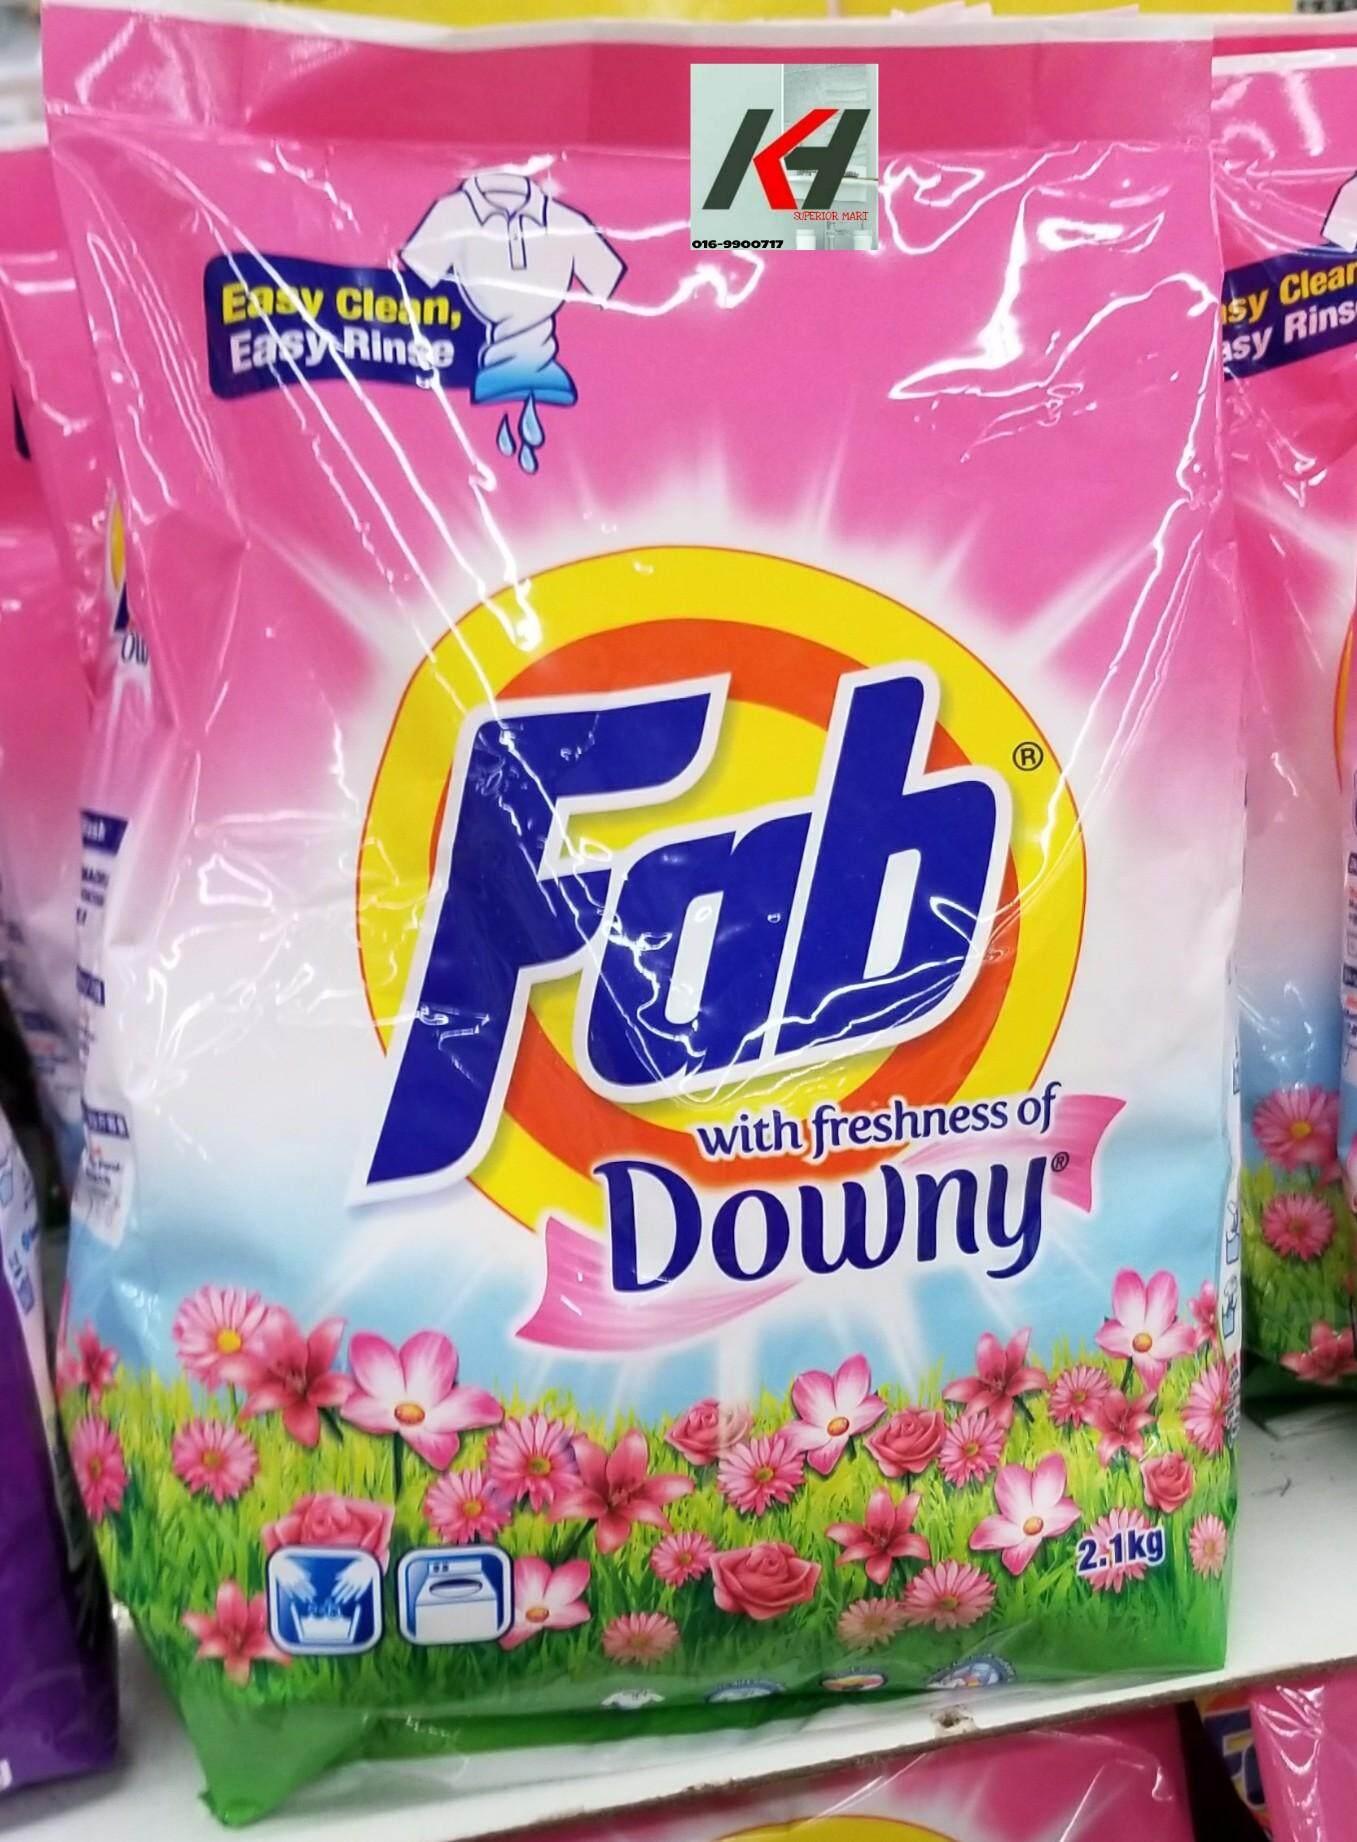 FAB DOWNY POWDER DETERGENT 2.1KG READYSTOCK